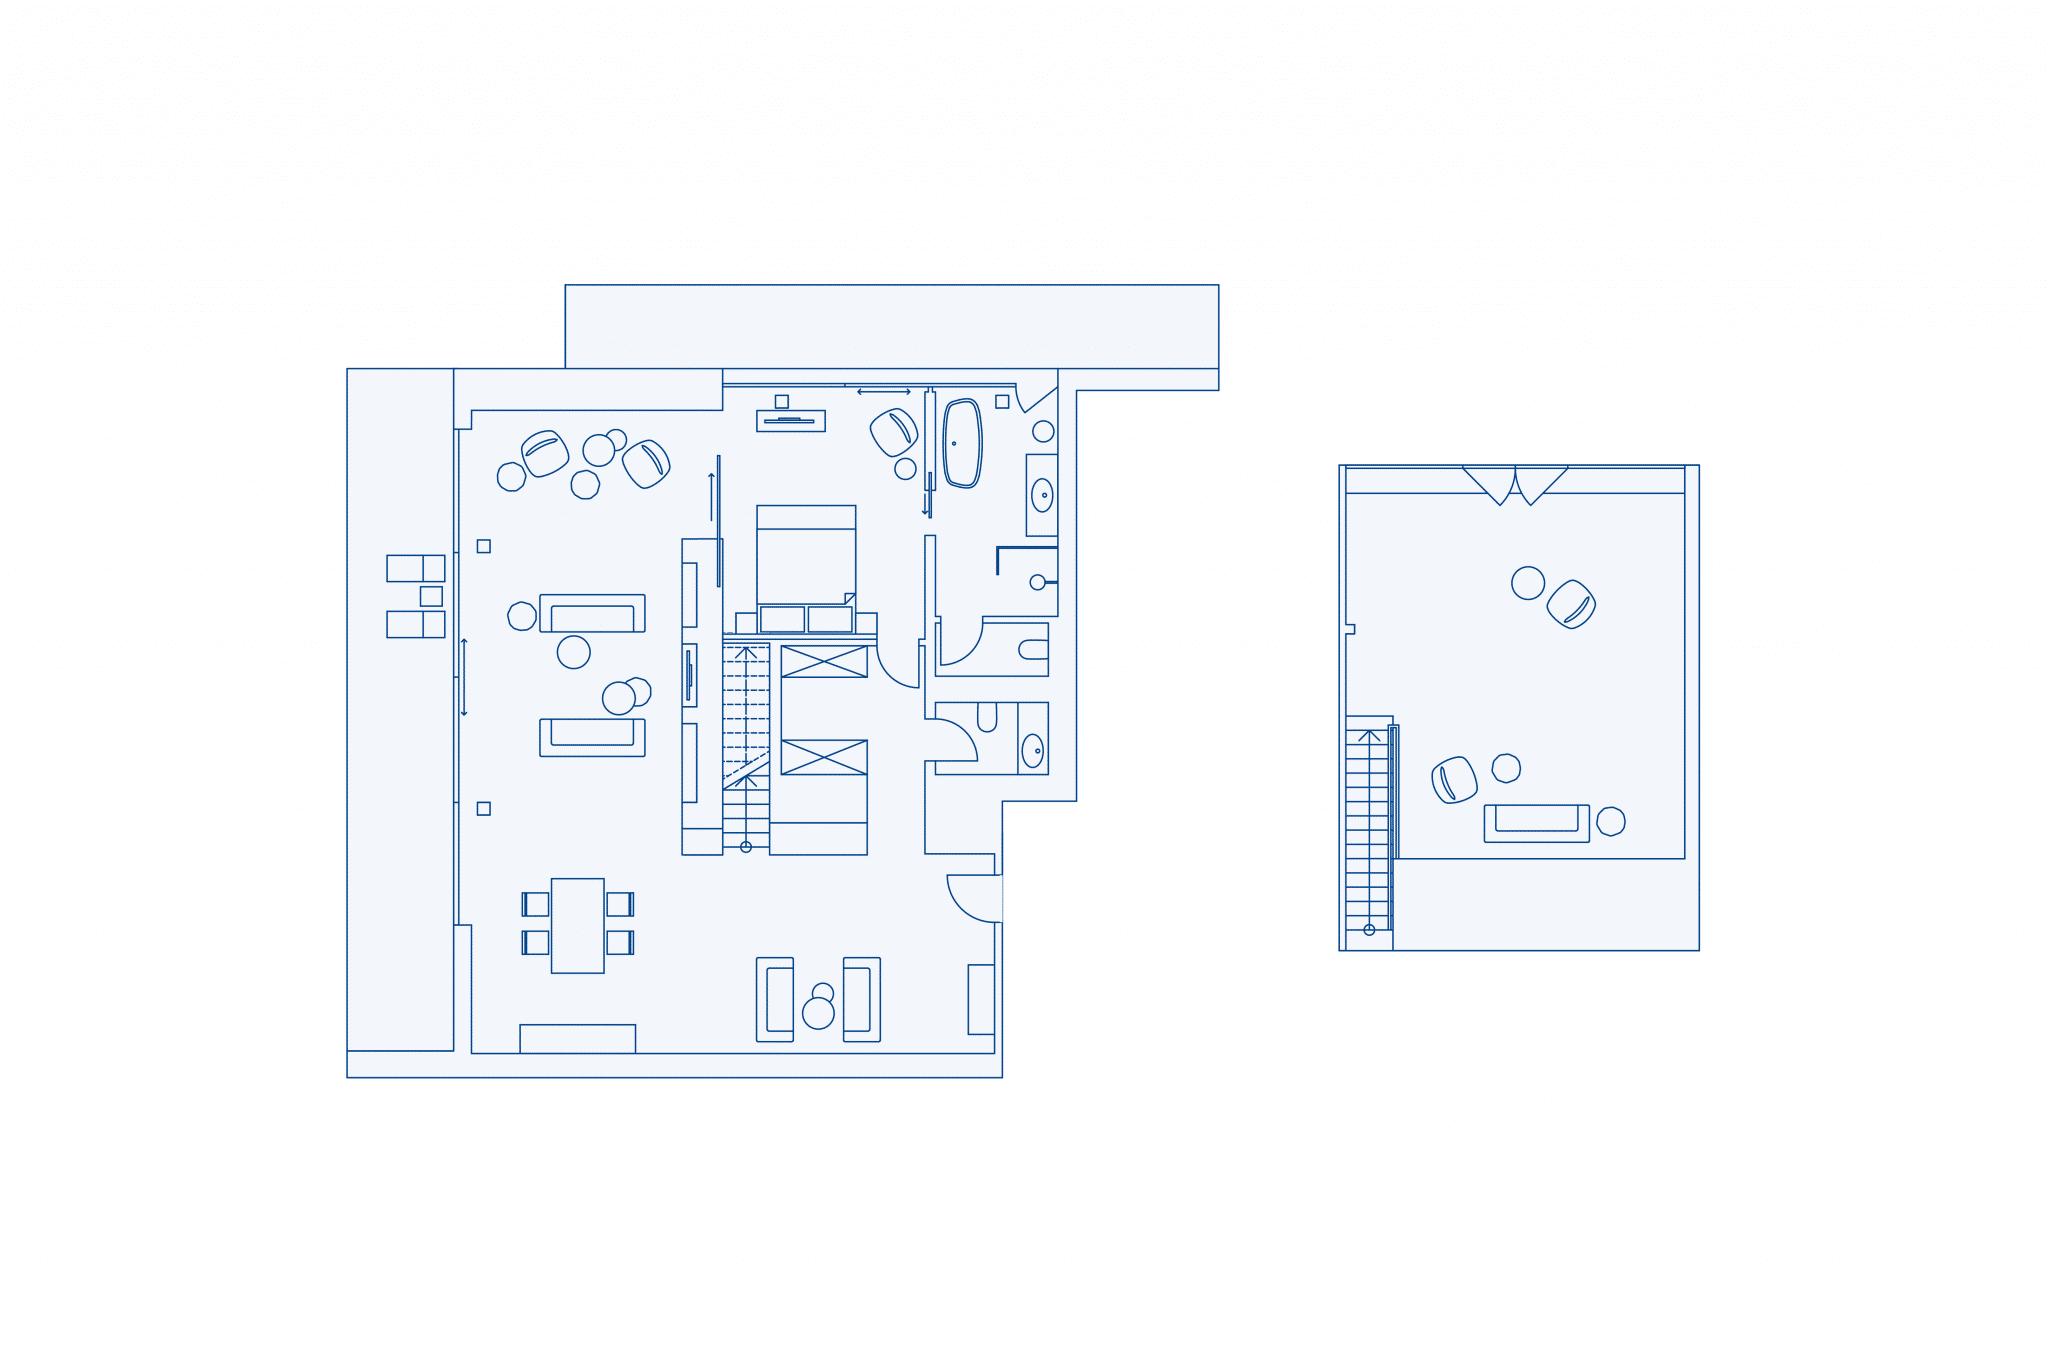 Room layout president suite at VIVAMAYR Altaussee